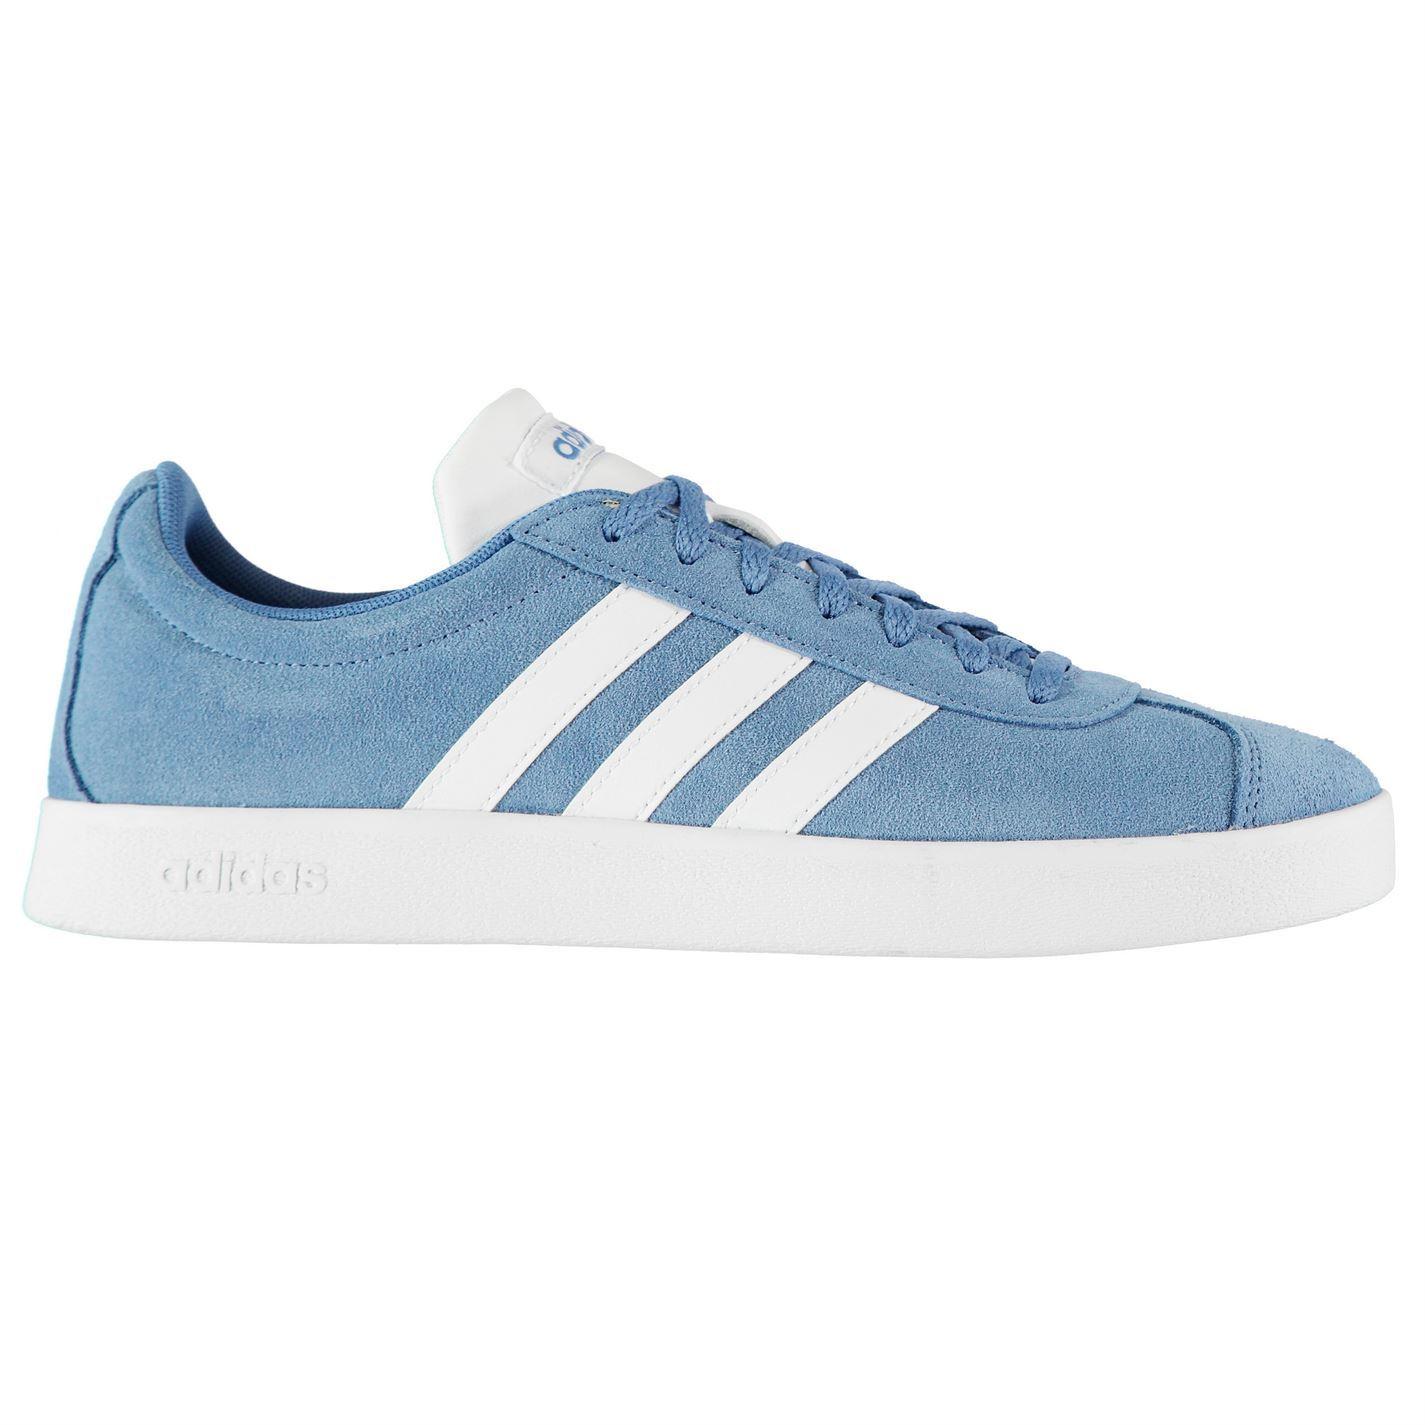 a224199e4b7 italy adidas matchcourt rx3 na kel white shoes 45d23 e73a5  france adidas  vl court 2 shoes mens gents suede be4ef b56a8